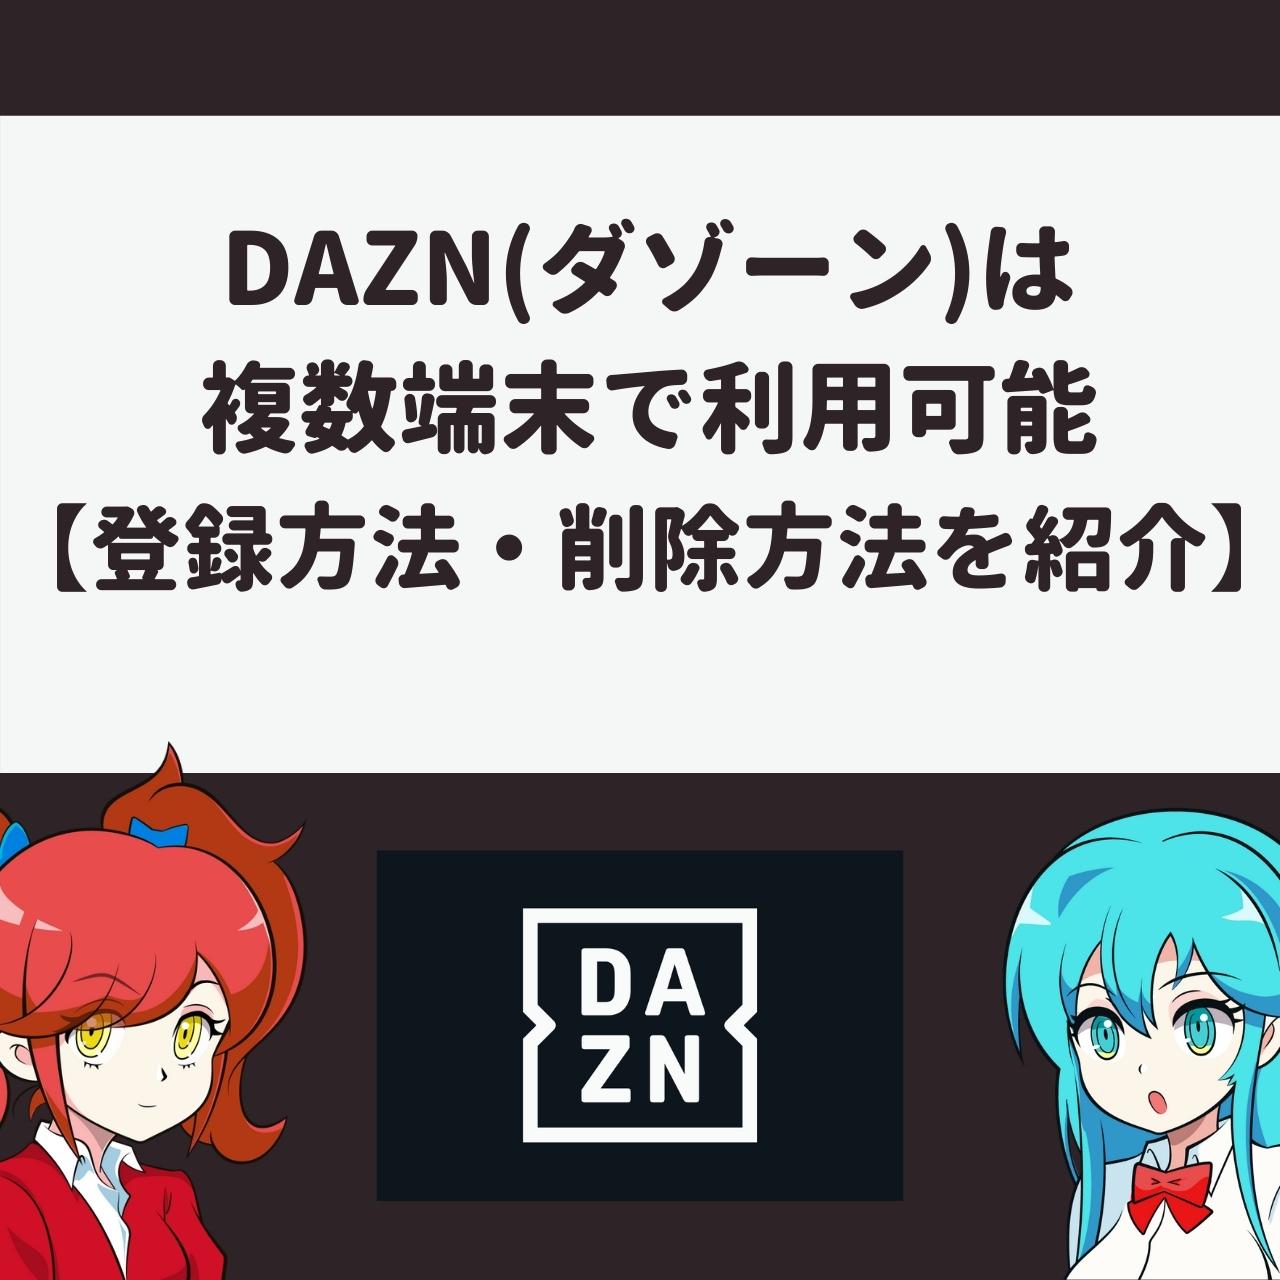 DAZN(ダゾーン)は複数端末で利用可能【登録方法・削除方法を紹介】